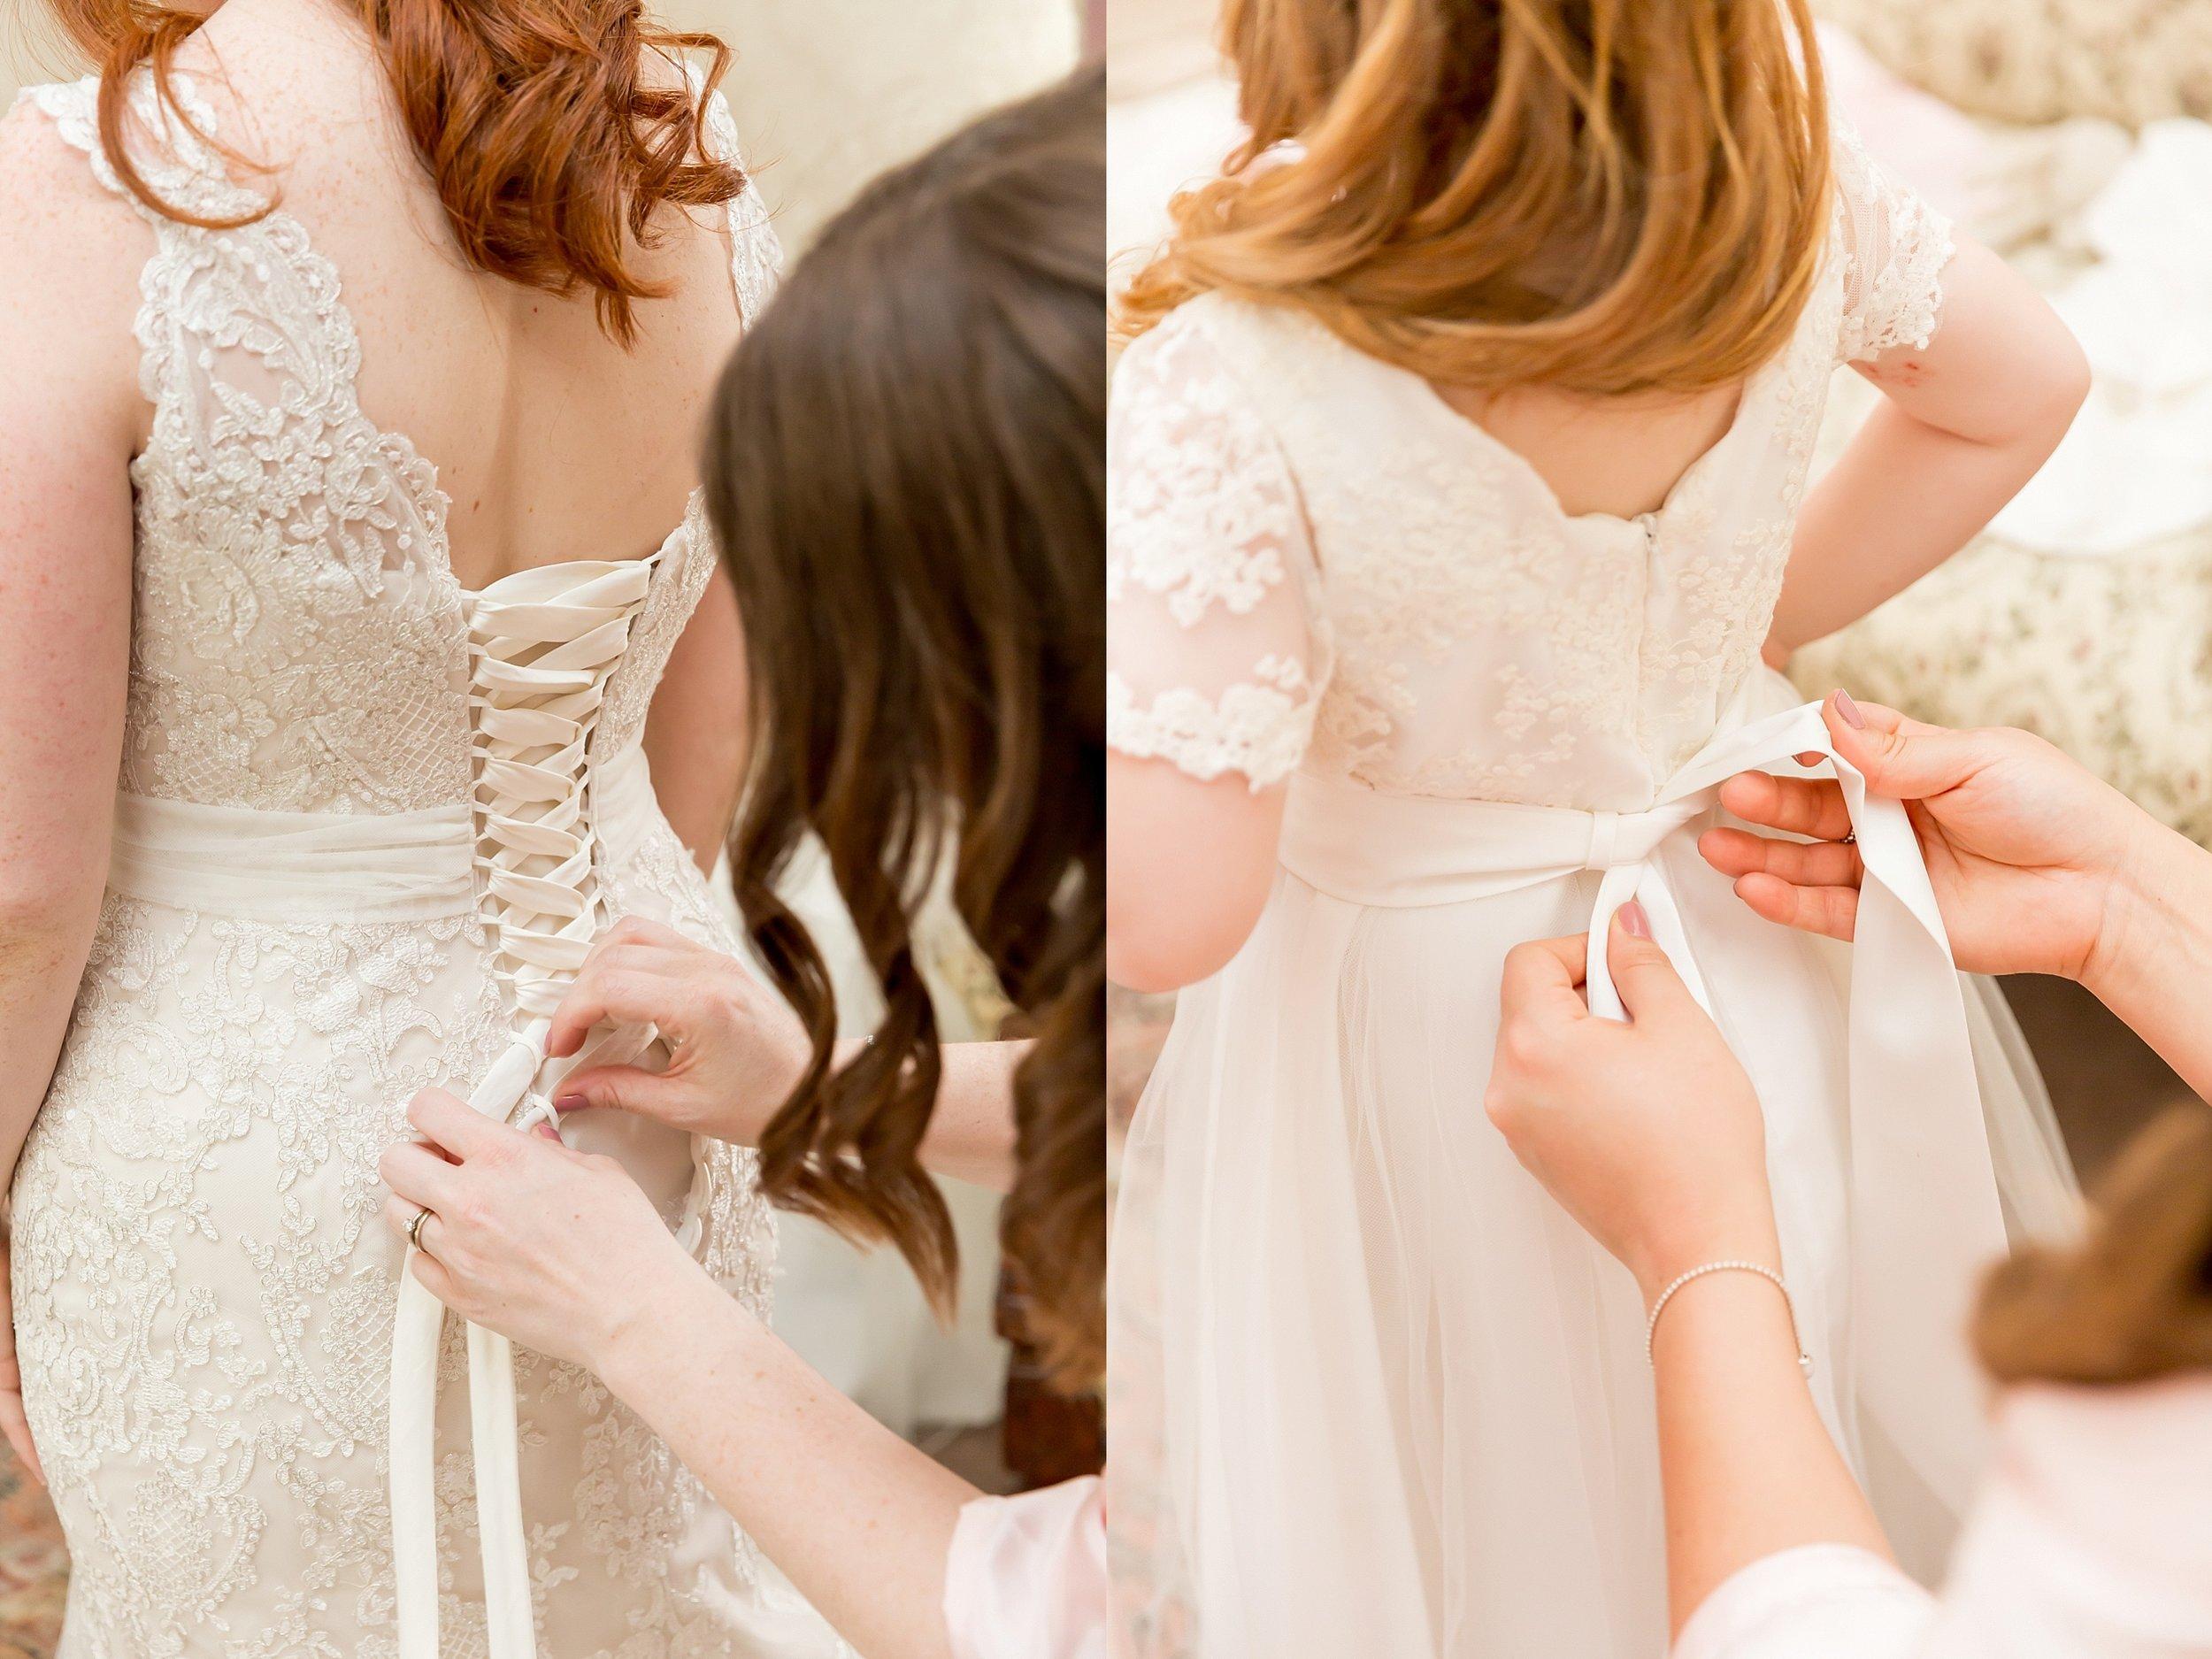 bridal prep mother and daughter.jpg